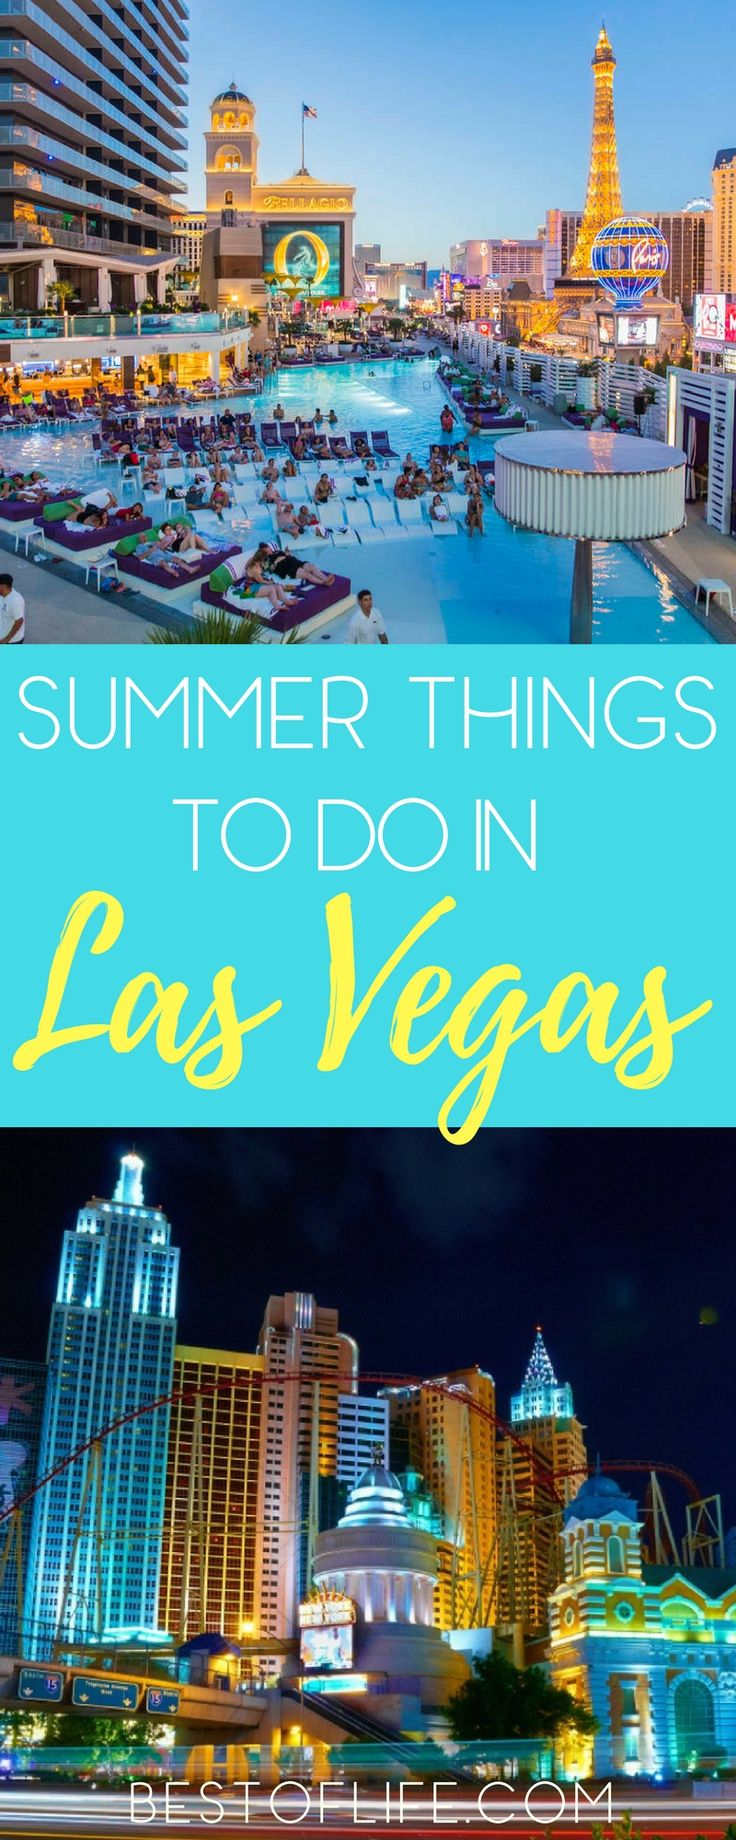 183 best Las Vegas images on Pinterest | Las vegas, Last vegas and ...